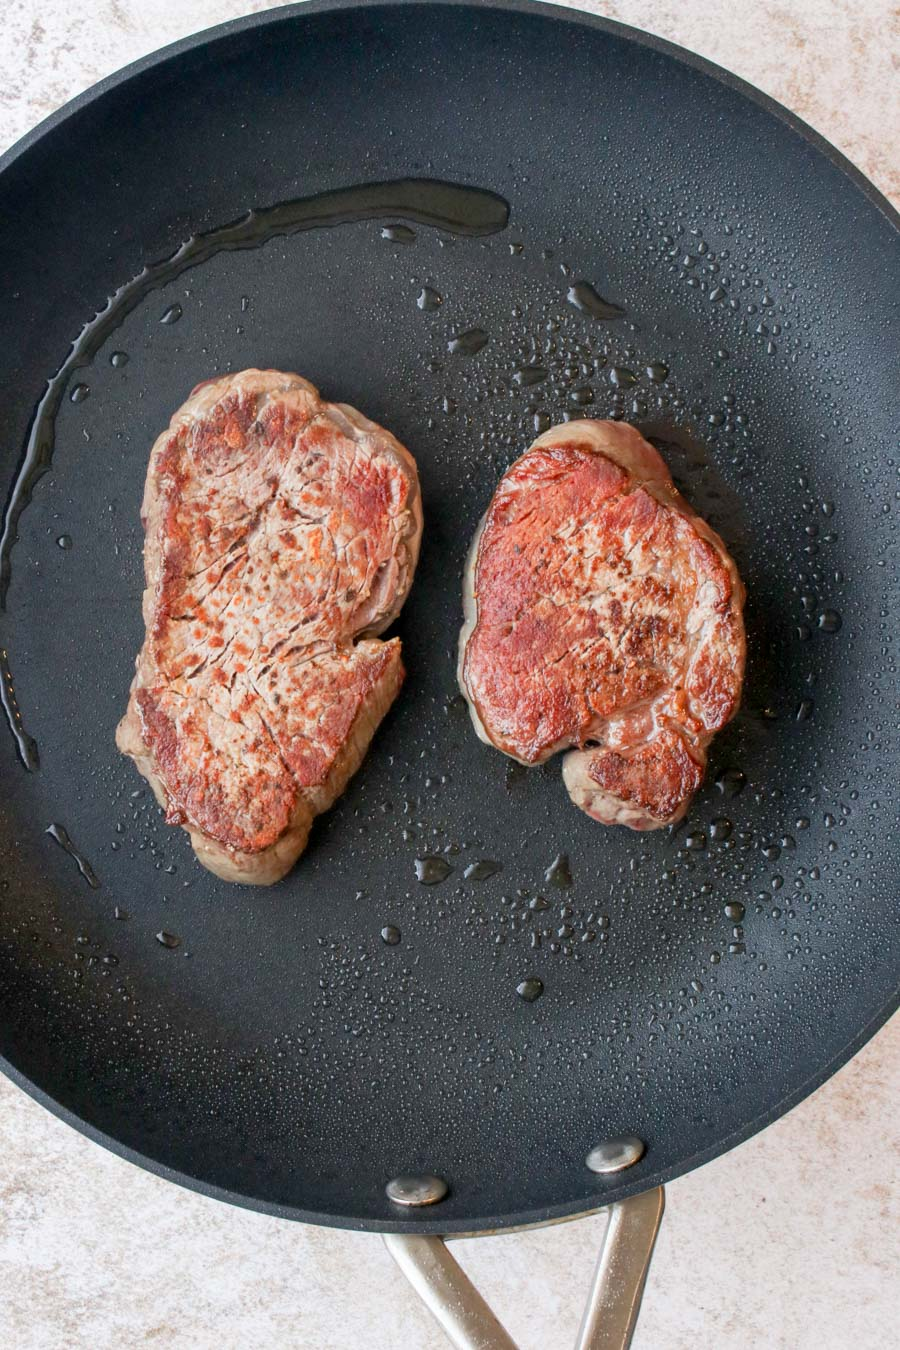 two filet steaks searing in a skillet